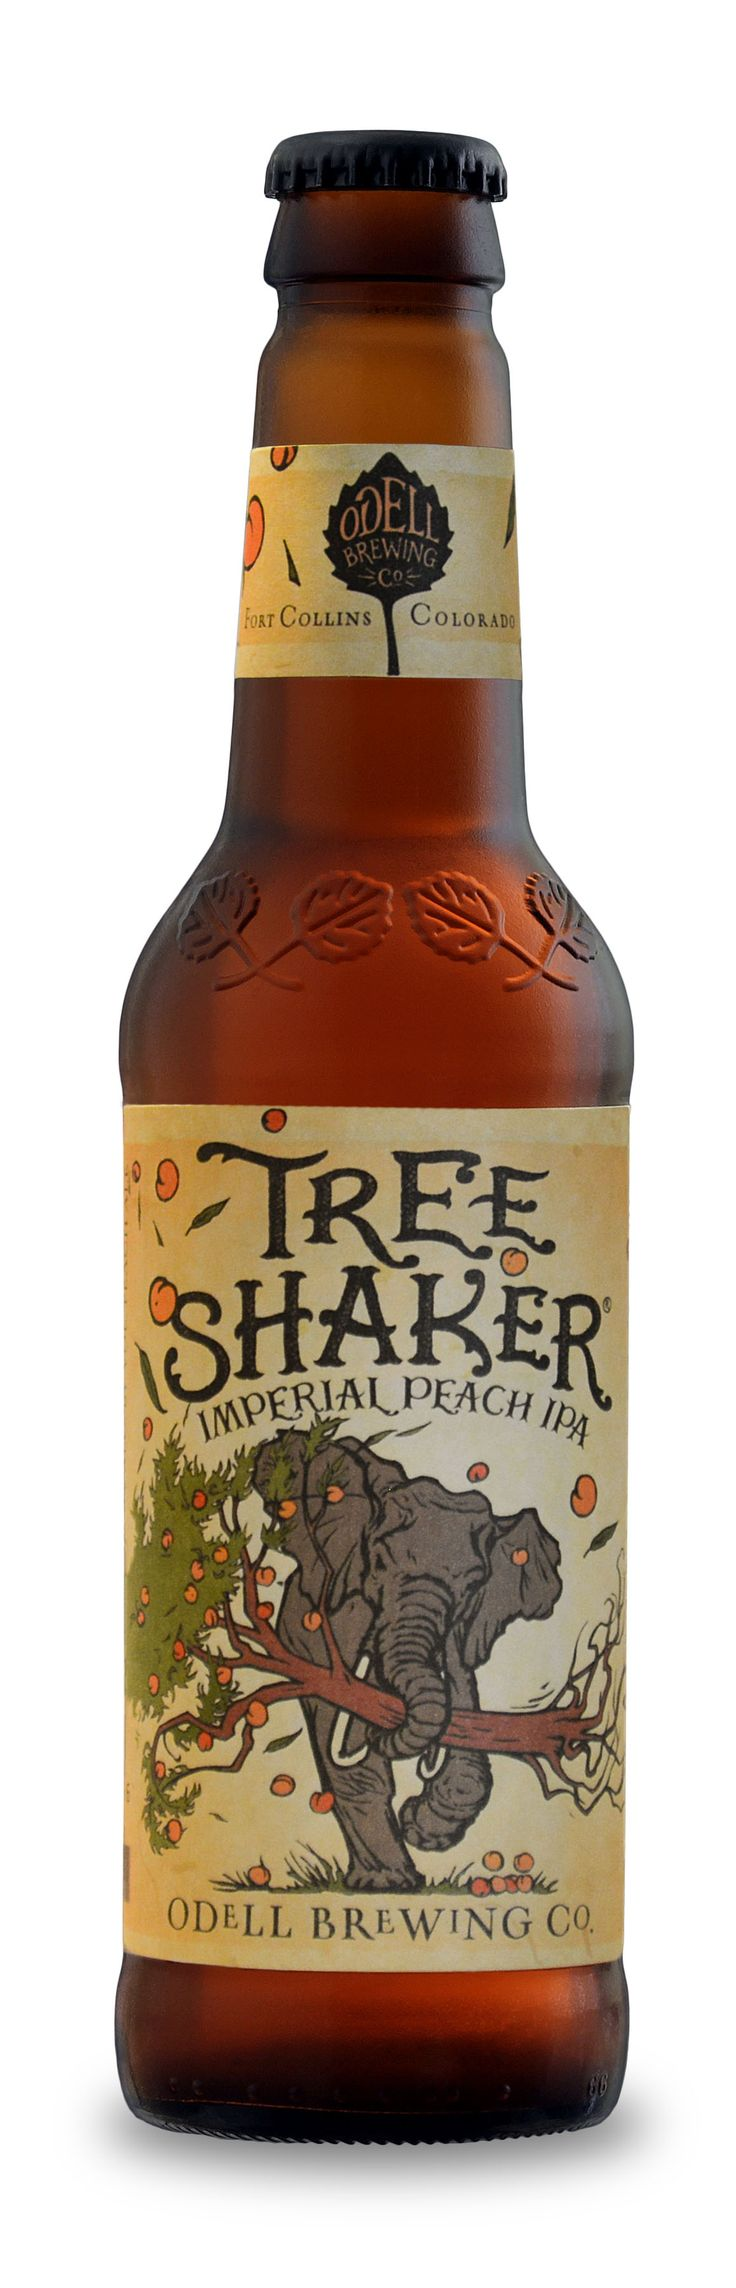 Tree Shaker Imperial Peach IPA #OdellBrewing #CraftBeer